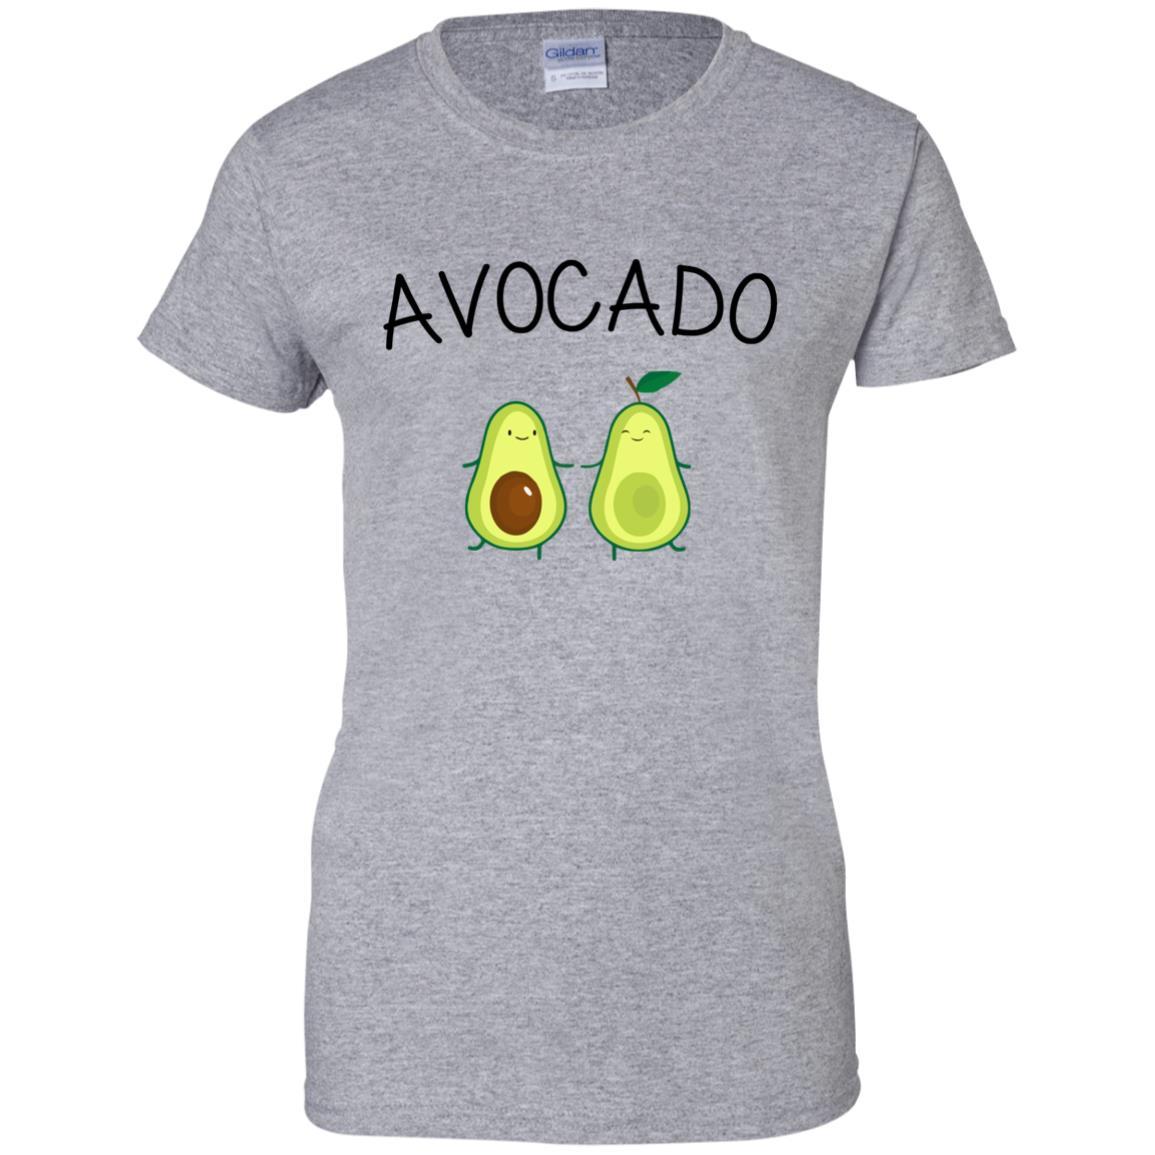 image 23 - Vegan Avocado Shirt, Sweater, Hoodie